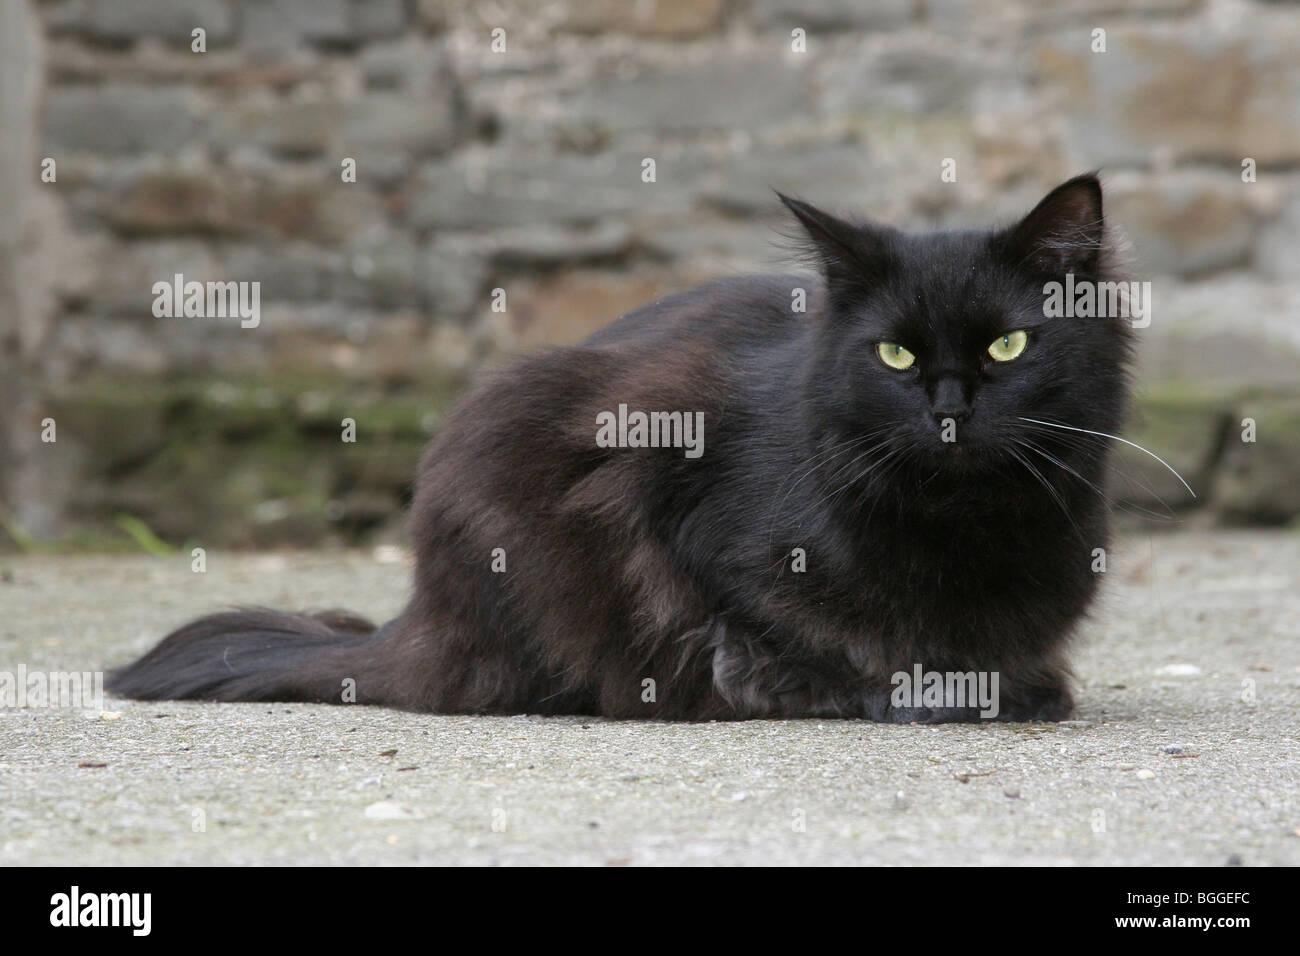 Domestic Cat (Felis silvestris, Felis catus). Black male in a backyard. - Stock Image